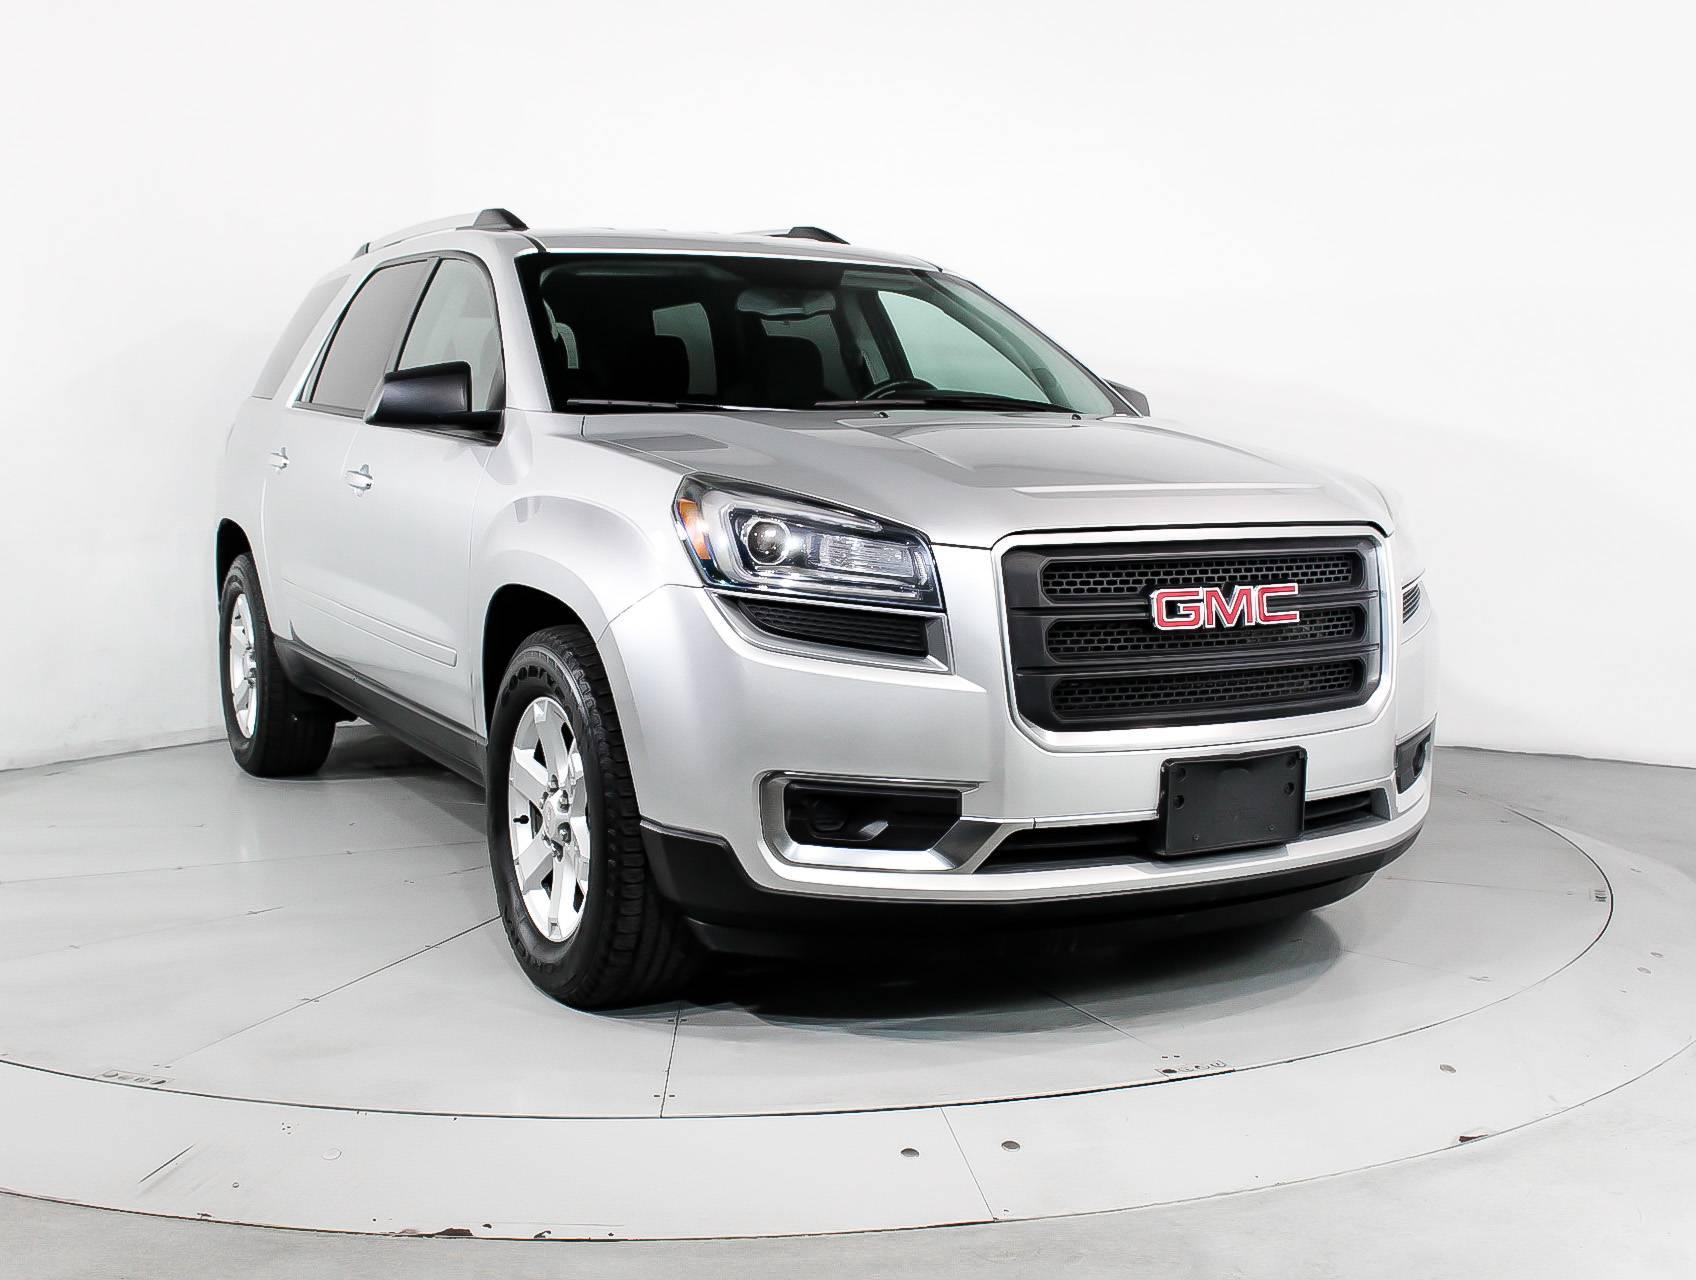 Used 2016 GMC ACADIA Sle1 Awd SUV for sale in MIAMI FL